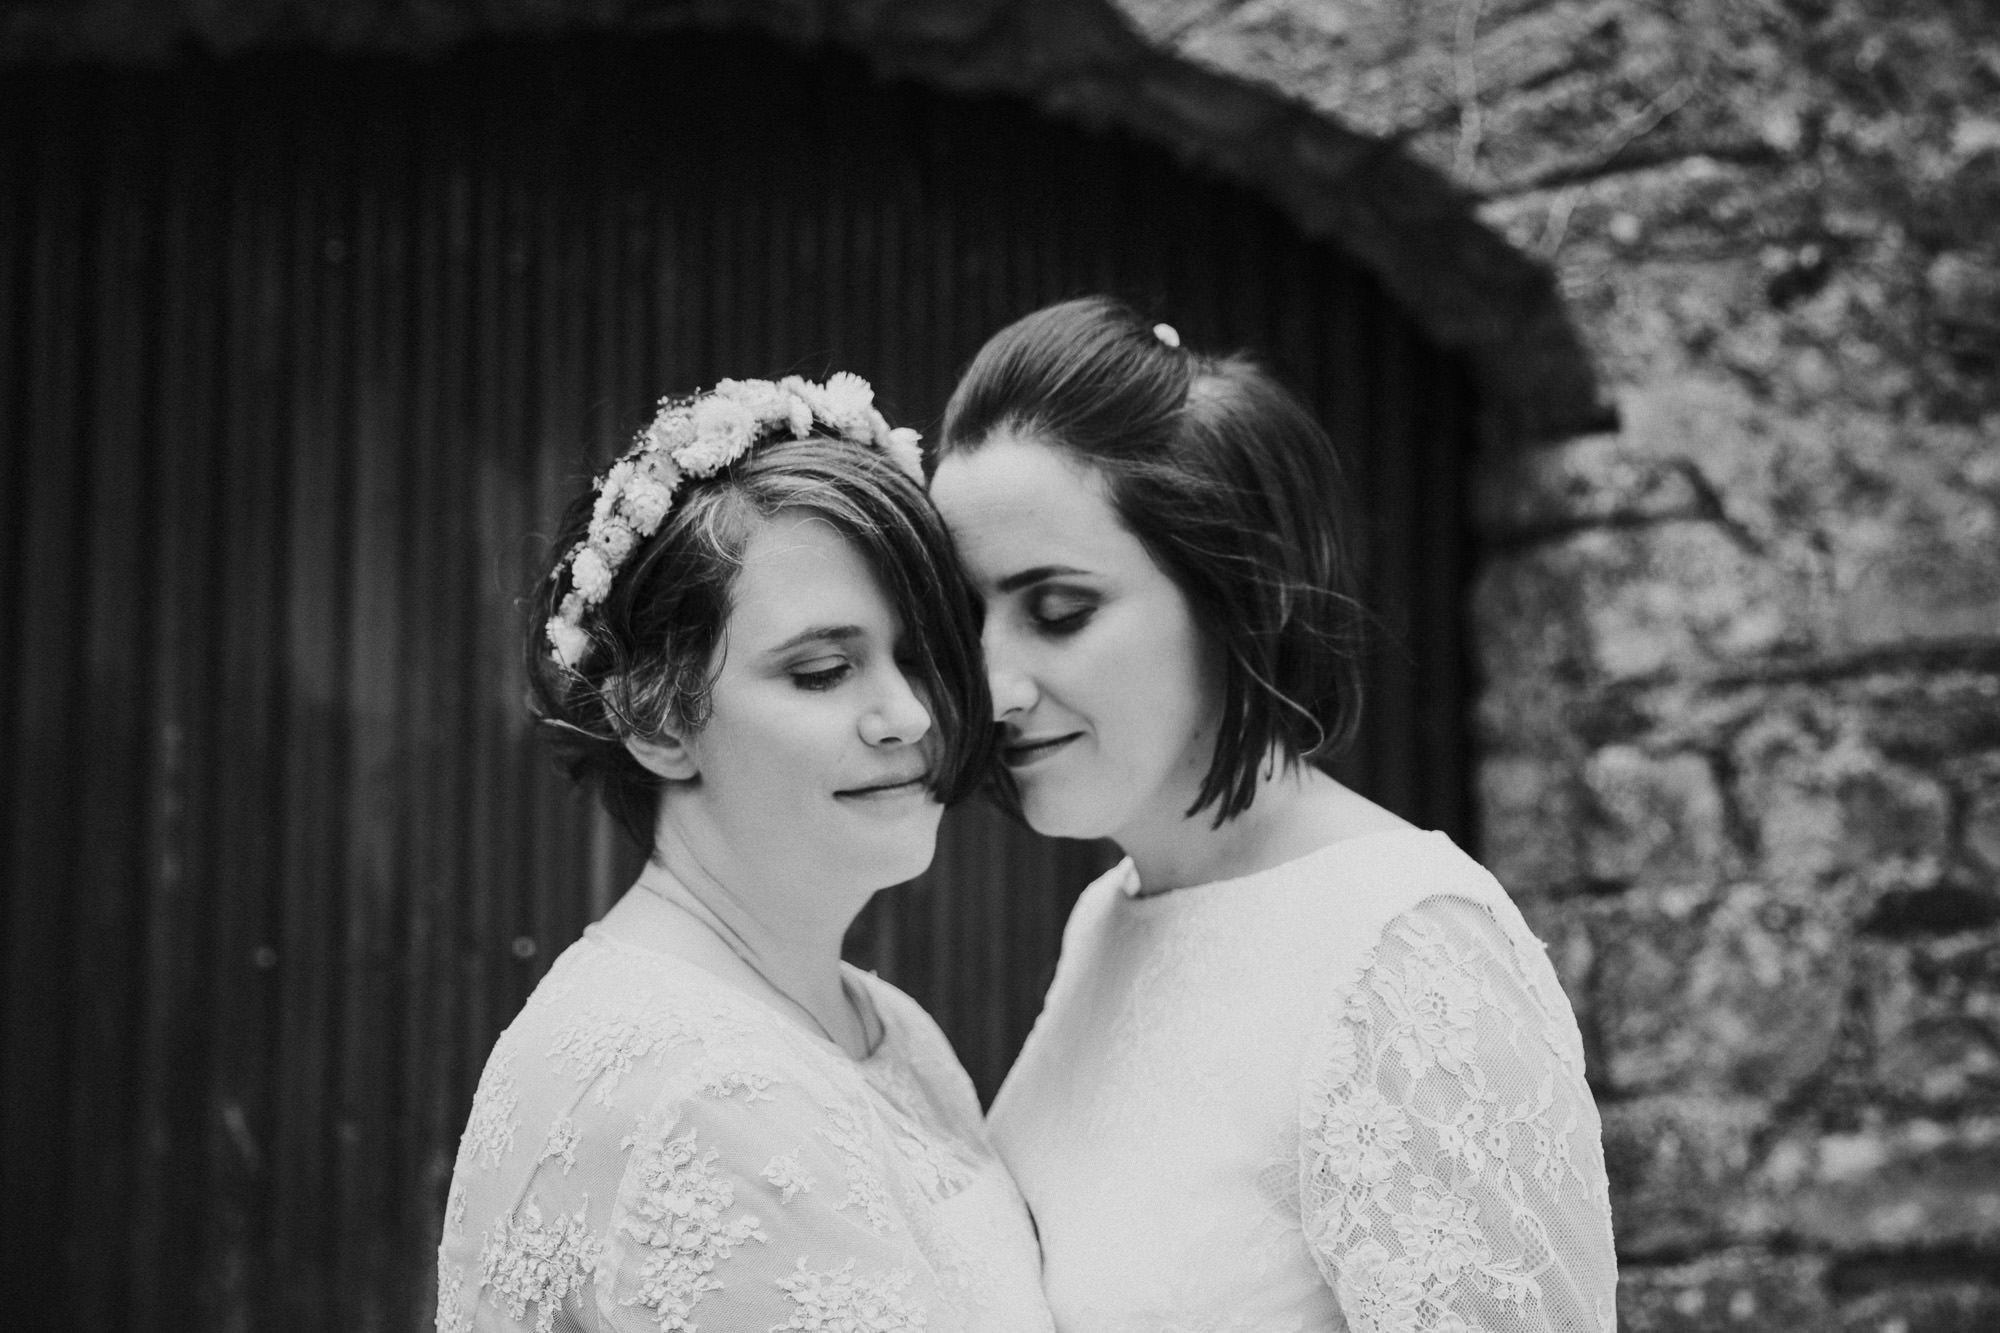 CLAIREBYRNEPHOTOGRAPHY-WEDDING-Ireland-cloncody-alternative-fun-Jen-Helena-17.jpg